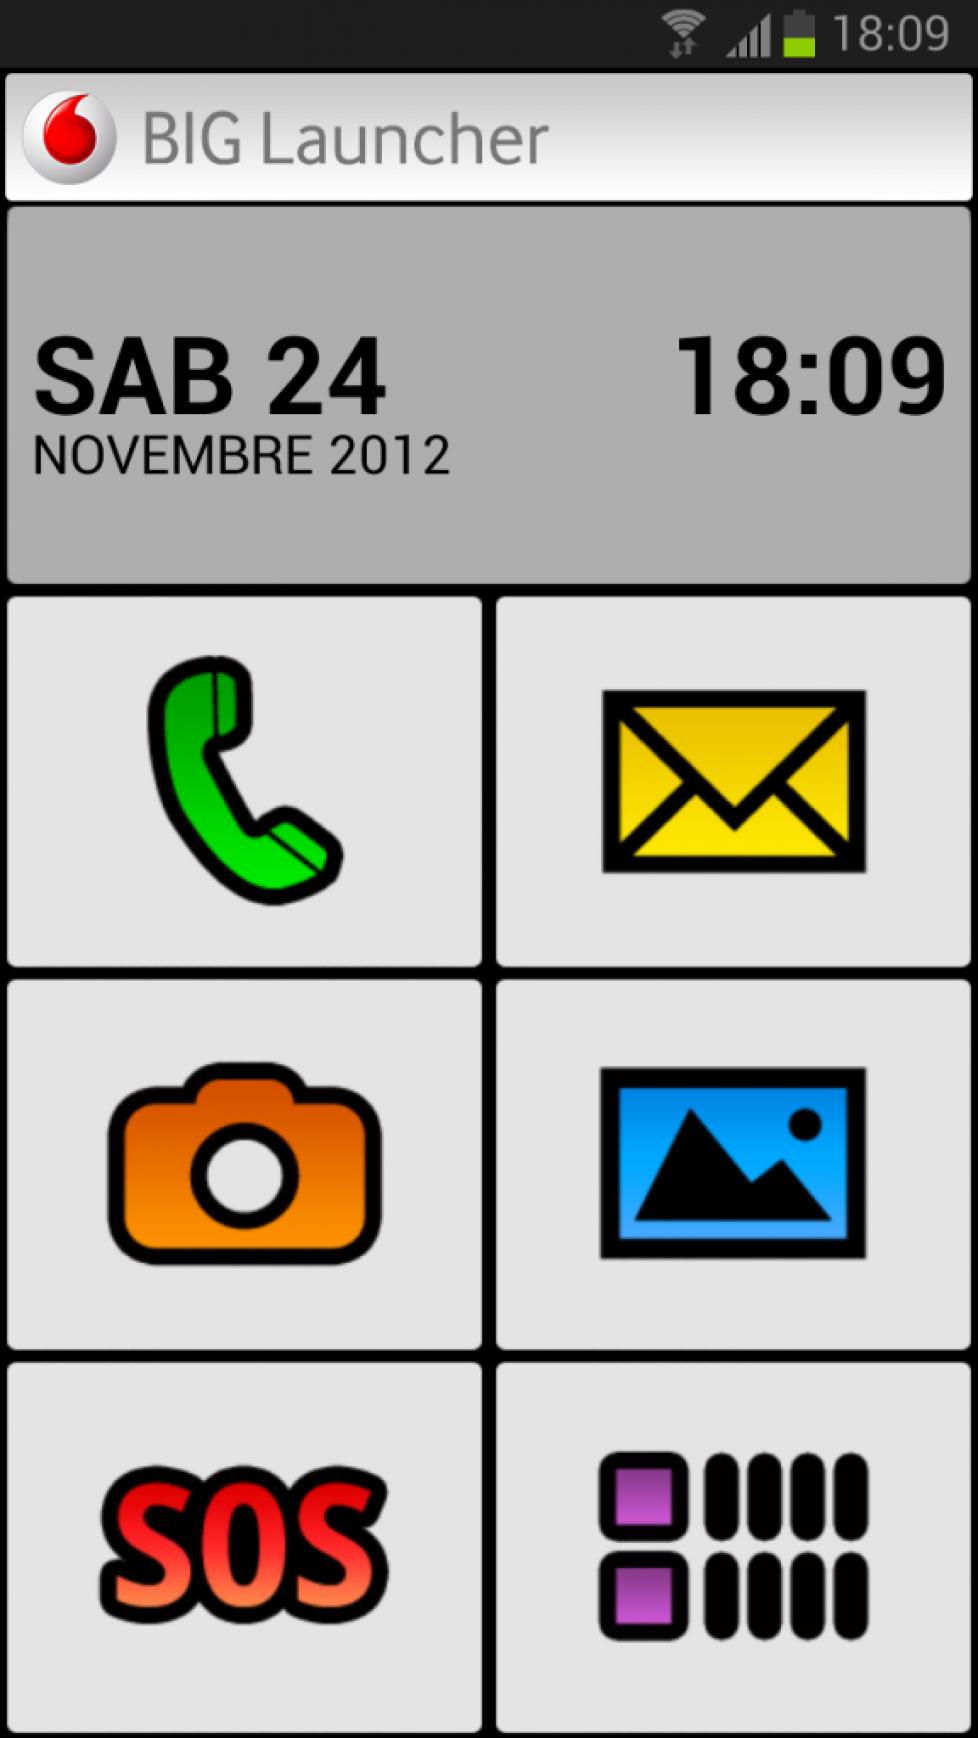 Vodafone BIG Launcher per Android